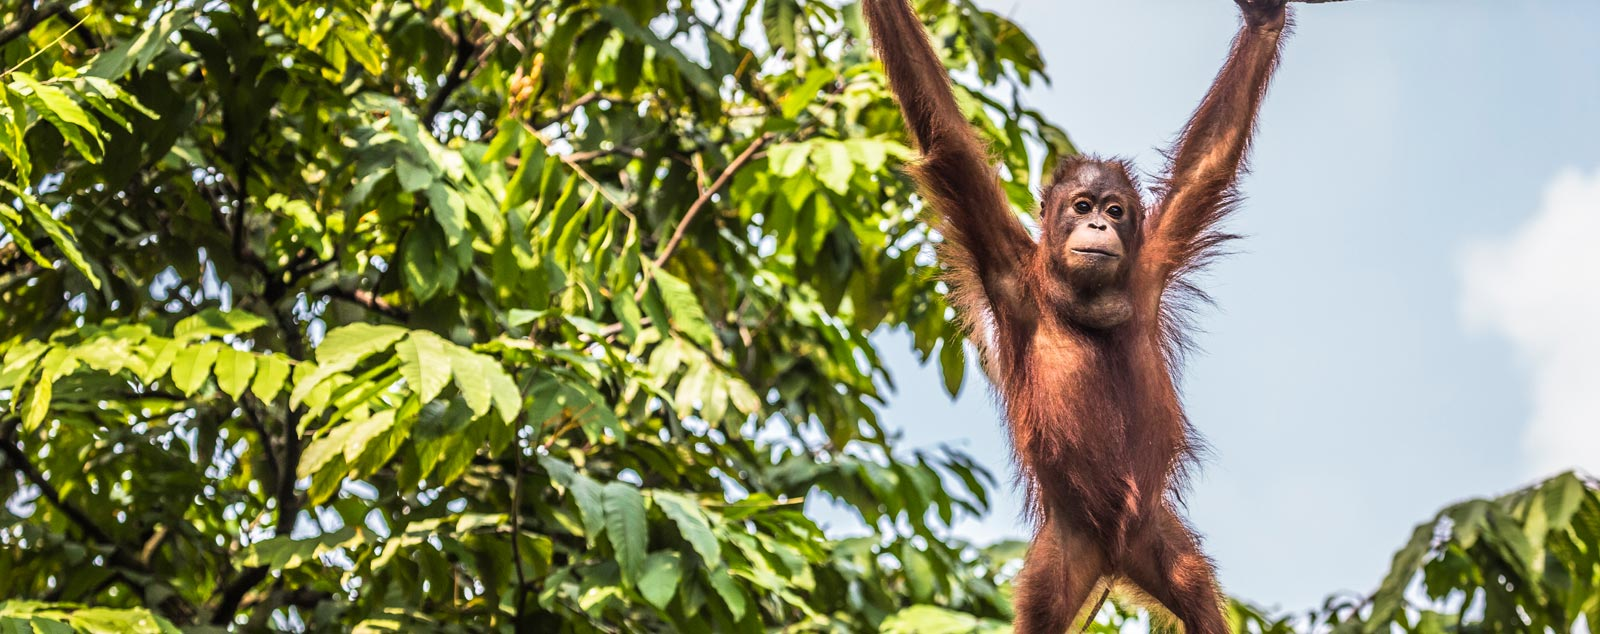 an orangutan baby hangs from a tree branch